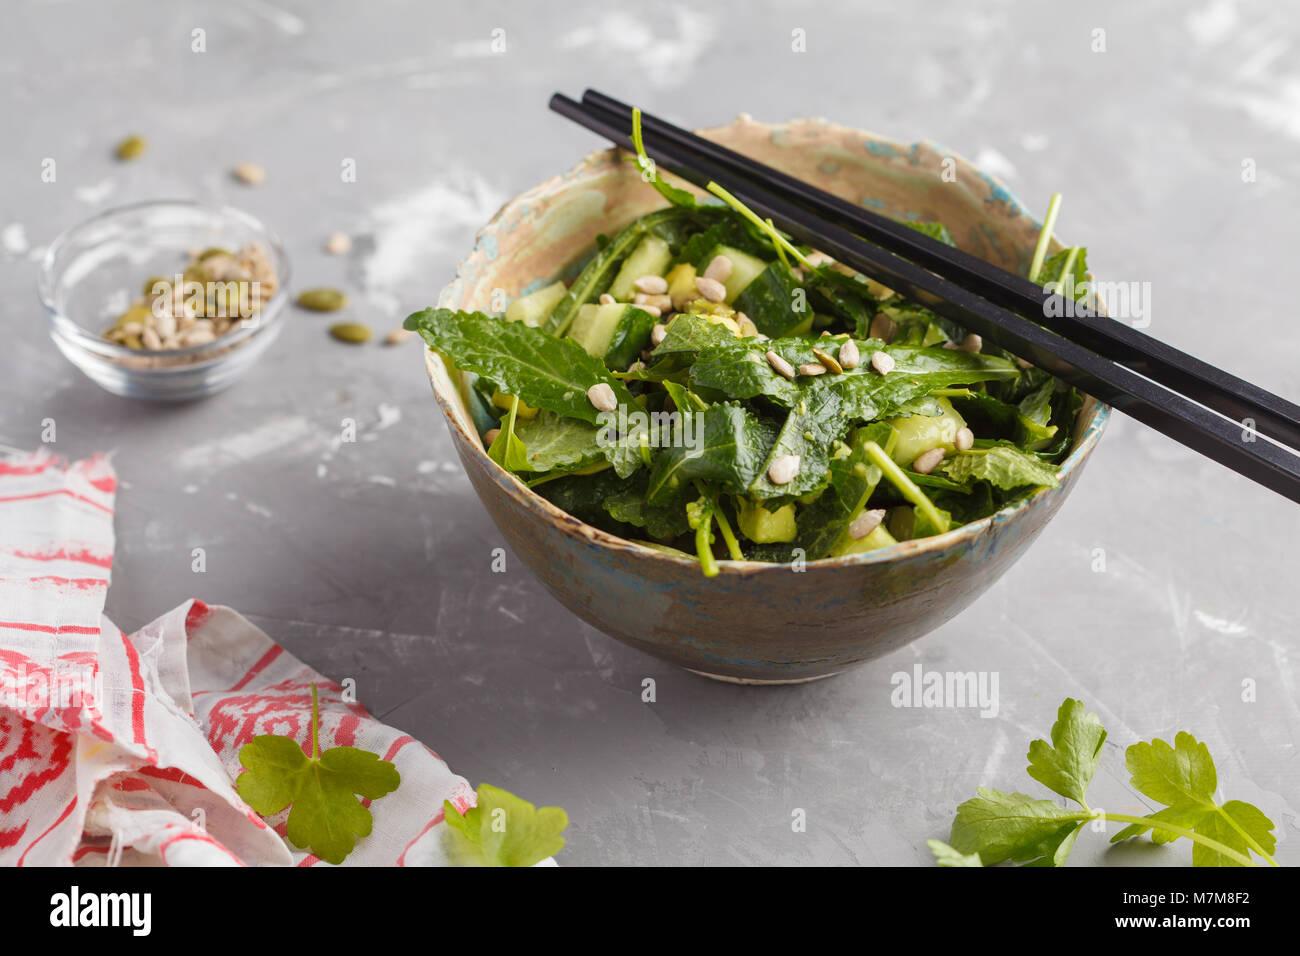 Grüne vegane Kale, Gurke, Sonnenblumenkerne, Salat. Gesunde vegetarische Essen Konzept. Stockbild